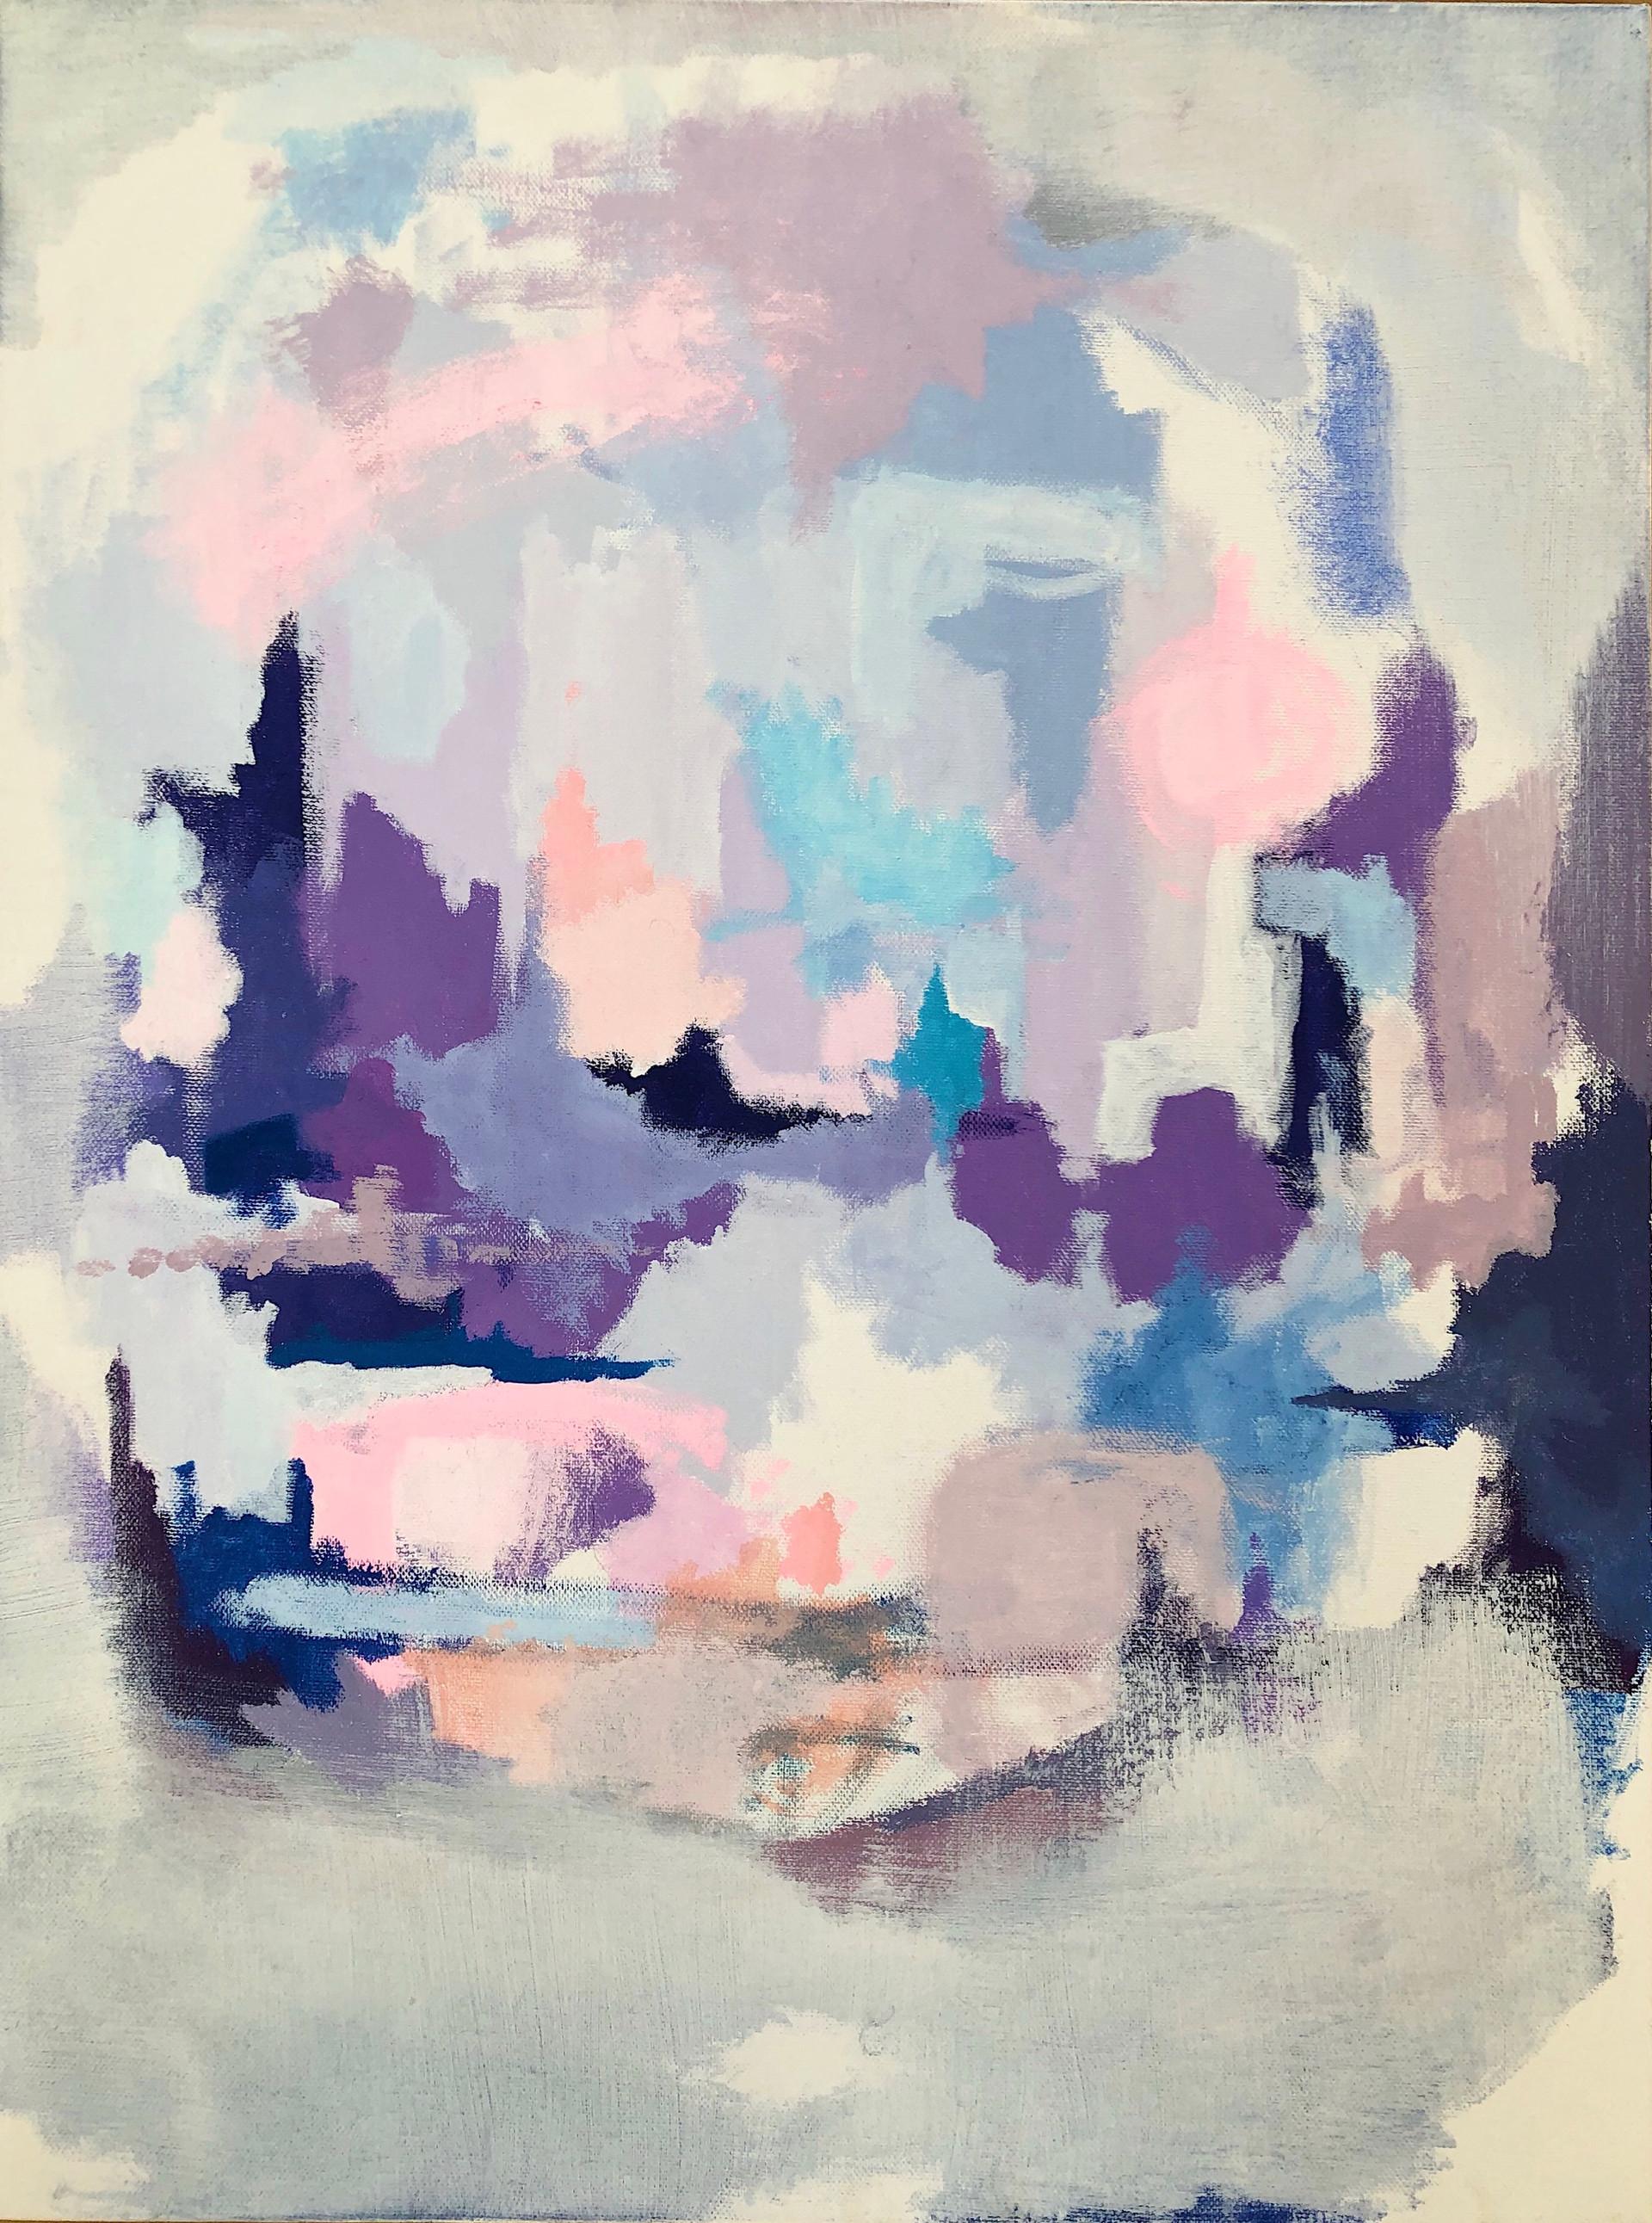 untitled. acrylic on canvas. 18x24.